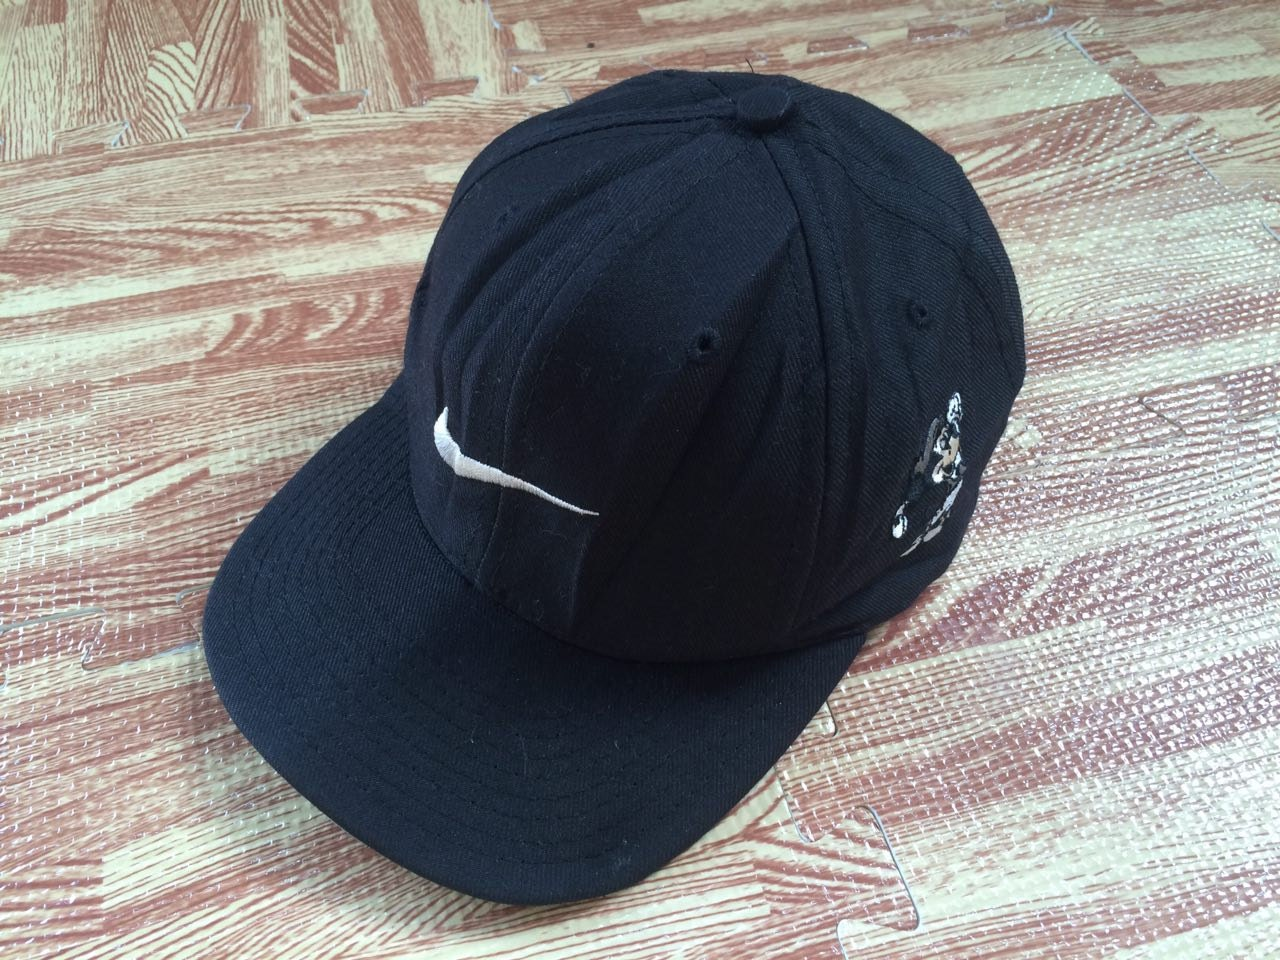 Relatively vintage 80s nike golf Walt Disney mickey mouse golfer cap hat HC93